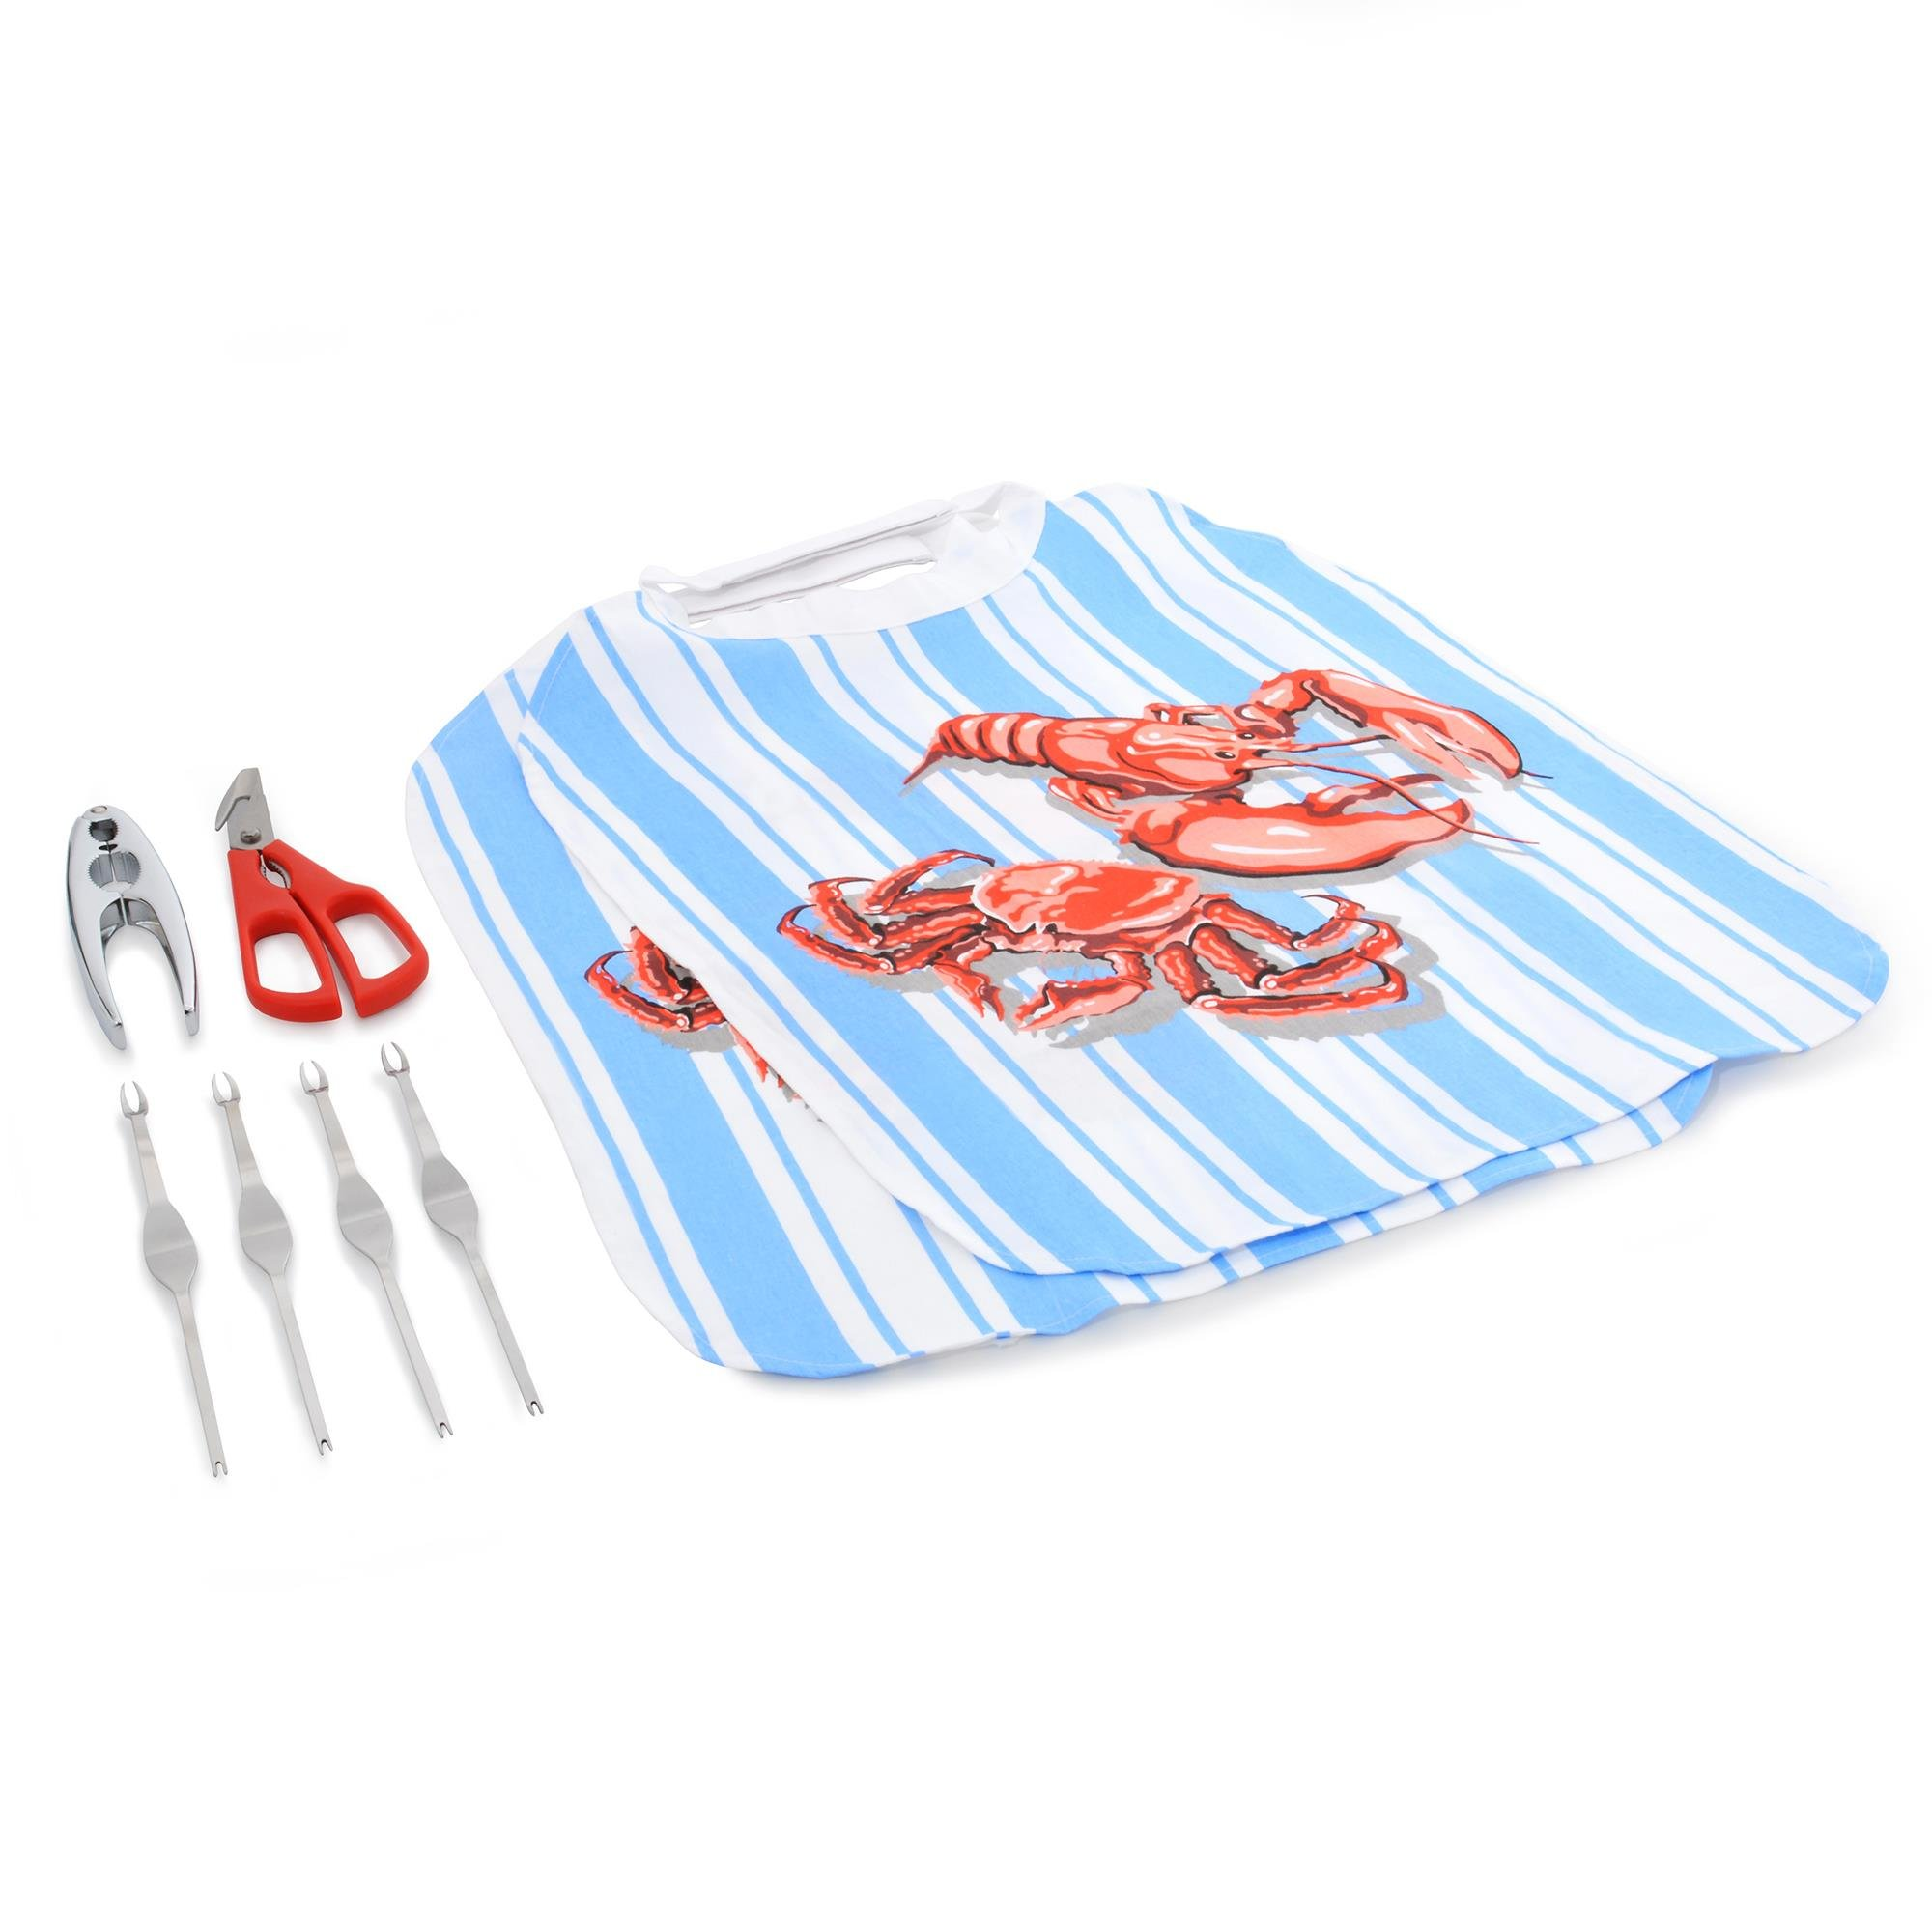 NORPRO Seafood Sets - Poacher, Crackers, Forks, Bibs, Oyster Knife (8-Pc)